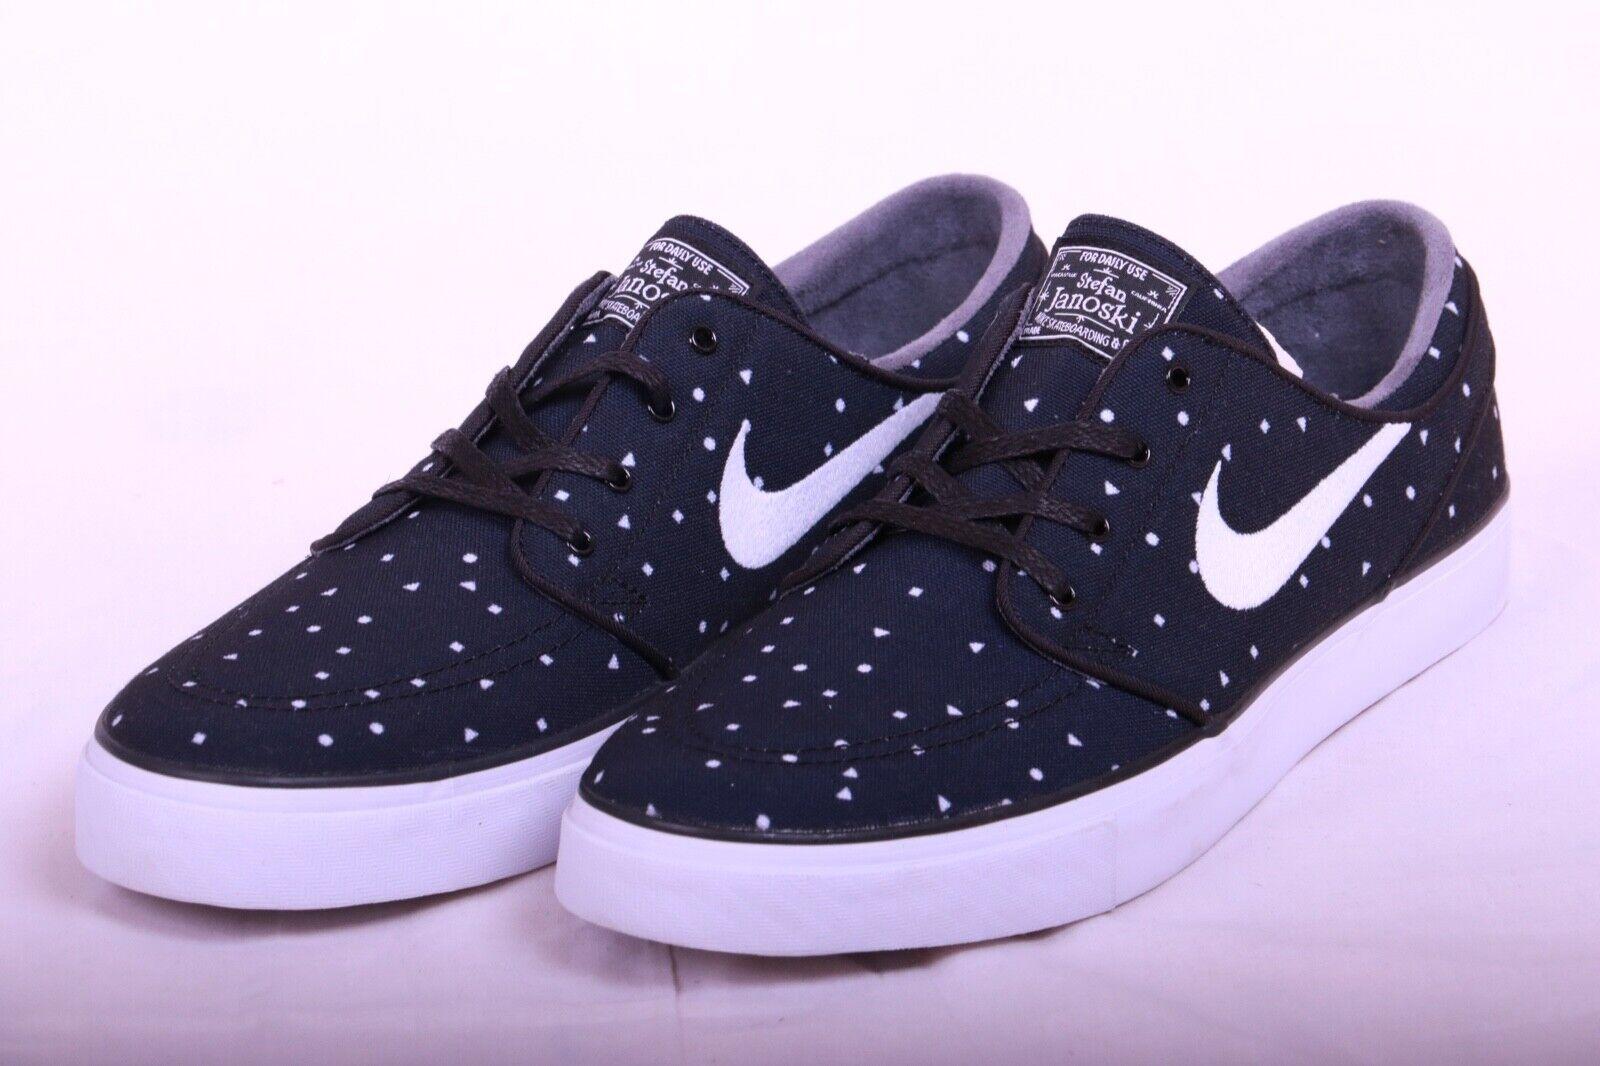 low priced 2d145 75839 Nike Men s Zoom Stefan Janoski Cnvs Cnvs Cnvs Prm Black White shoes Sz  705190 005 Sz